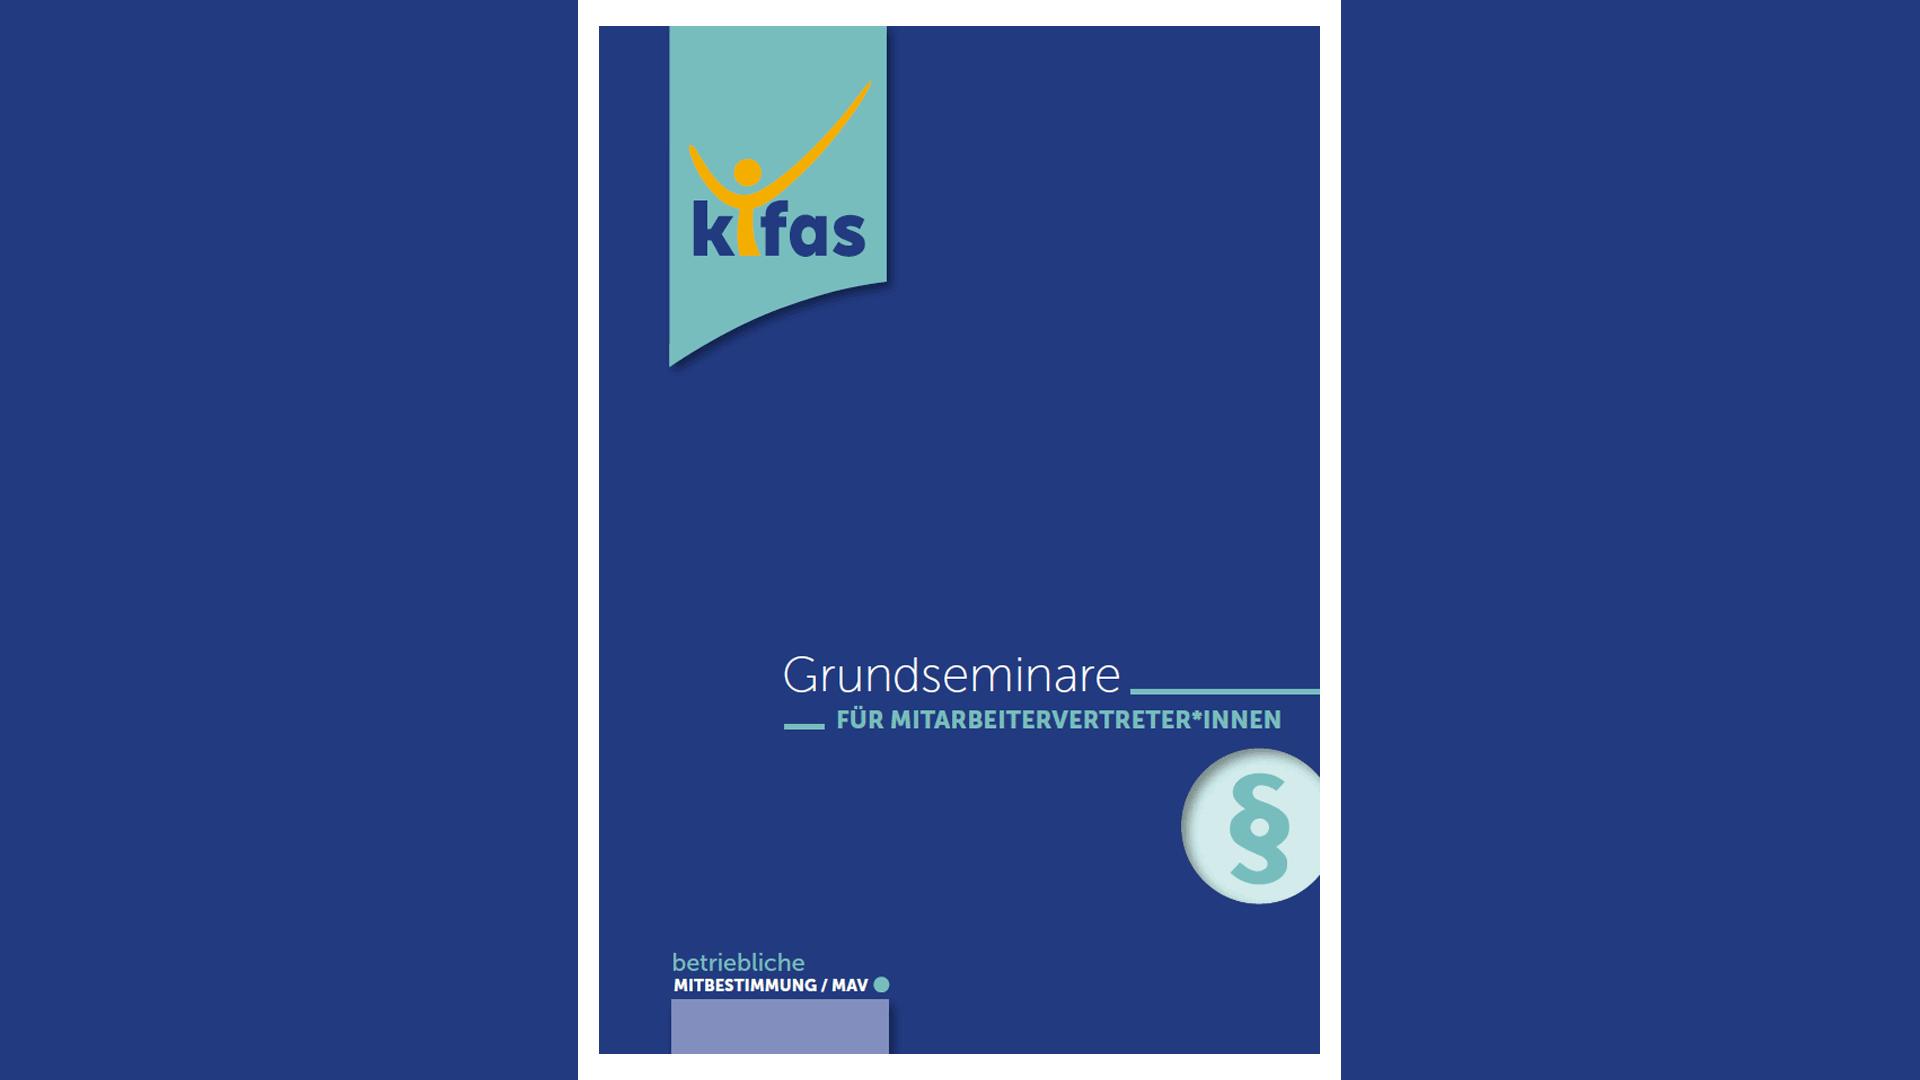 Grundseminare Termine 2022 - kifas GmbH